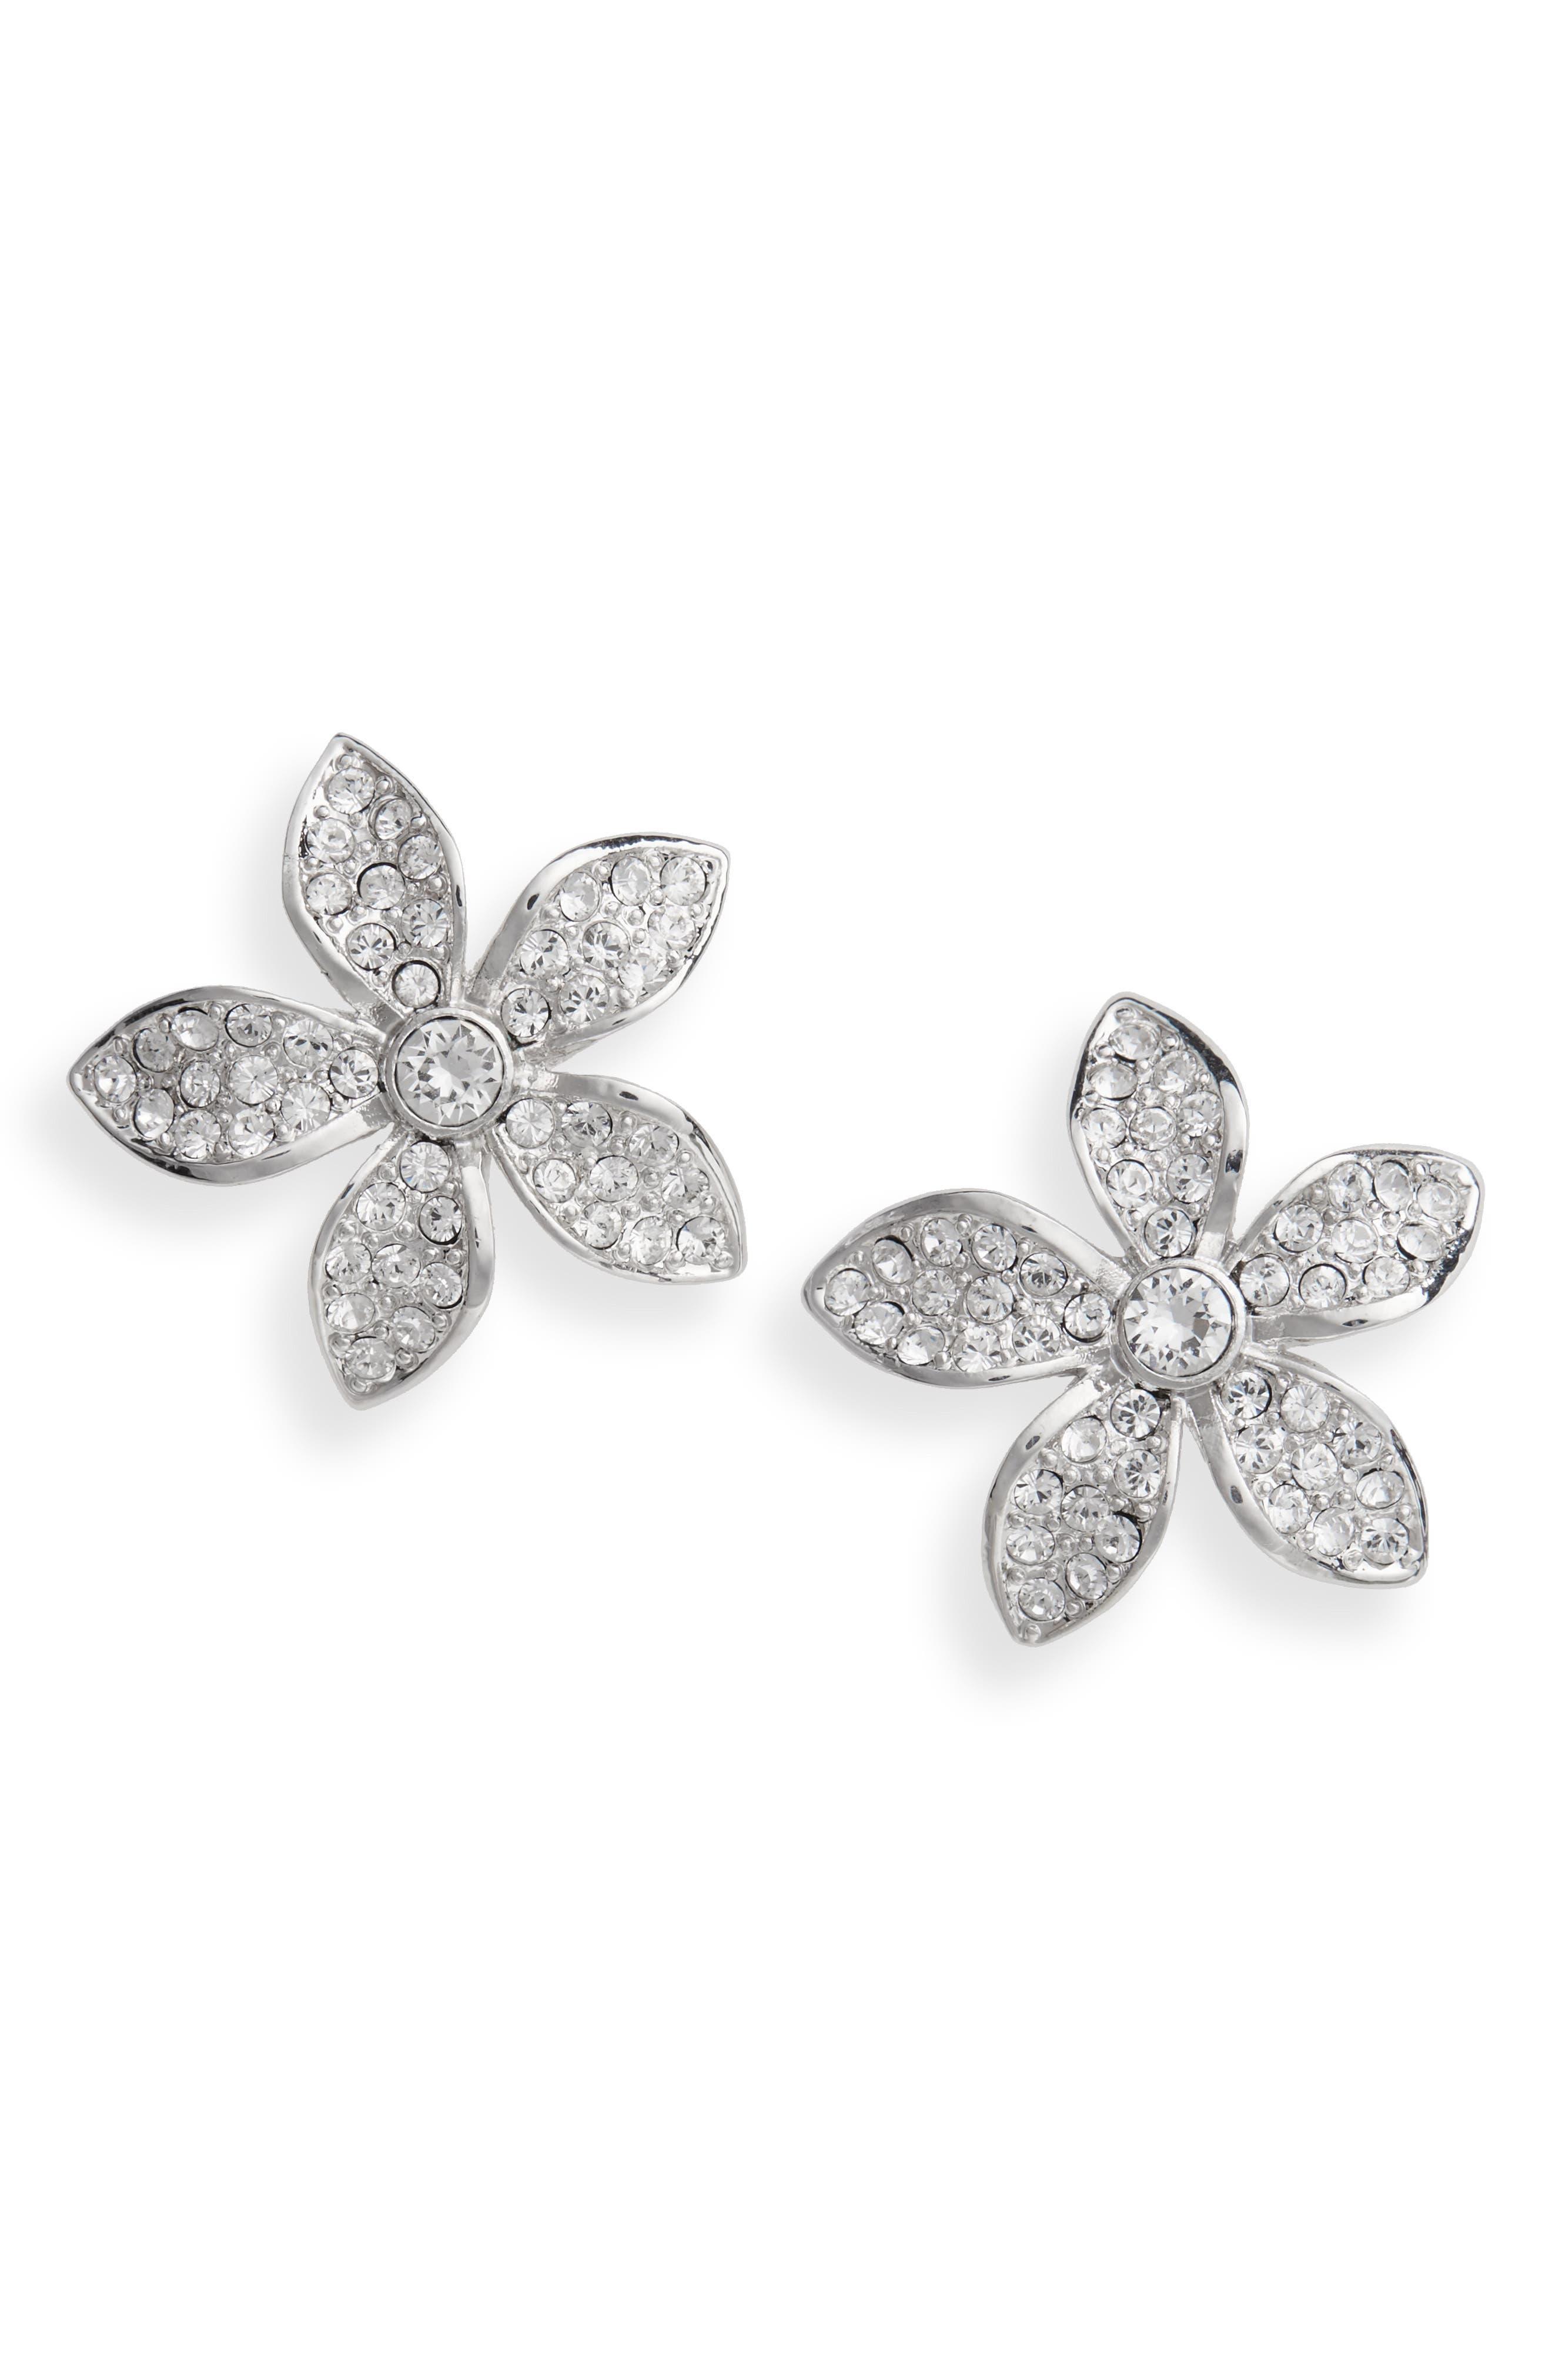 Floral Crystal Stud Earrings,                             Alternate thumbnail 2, color,